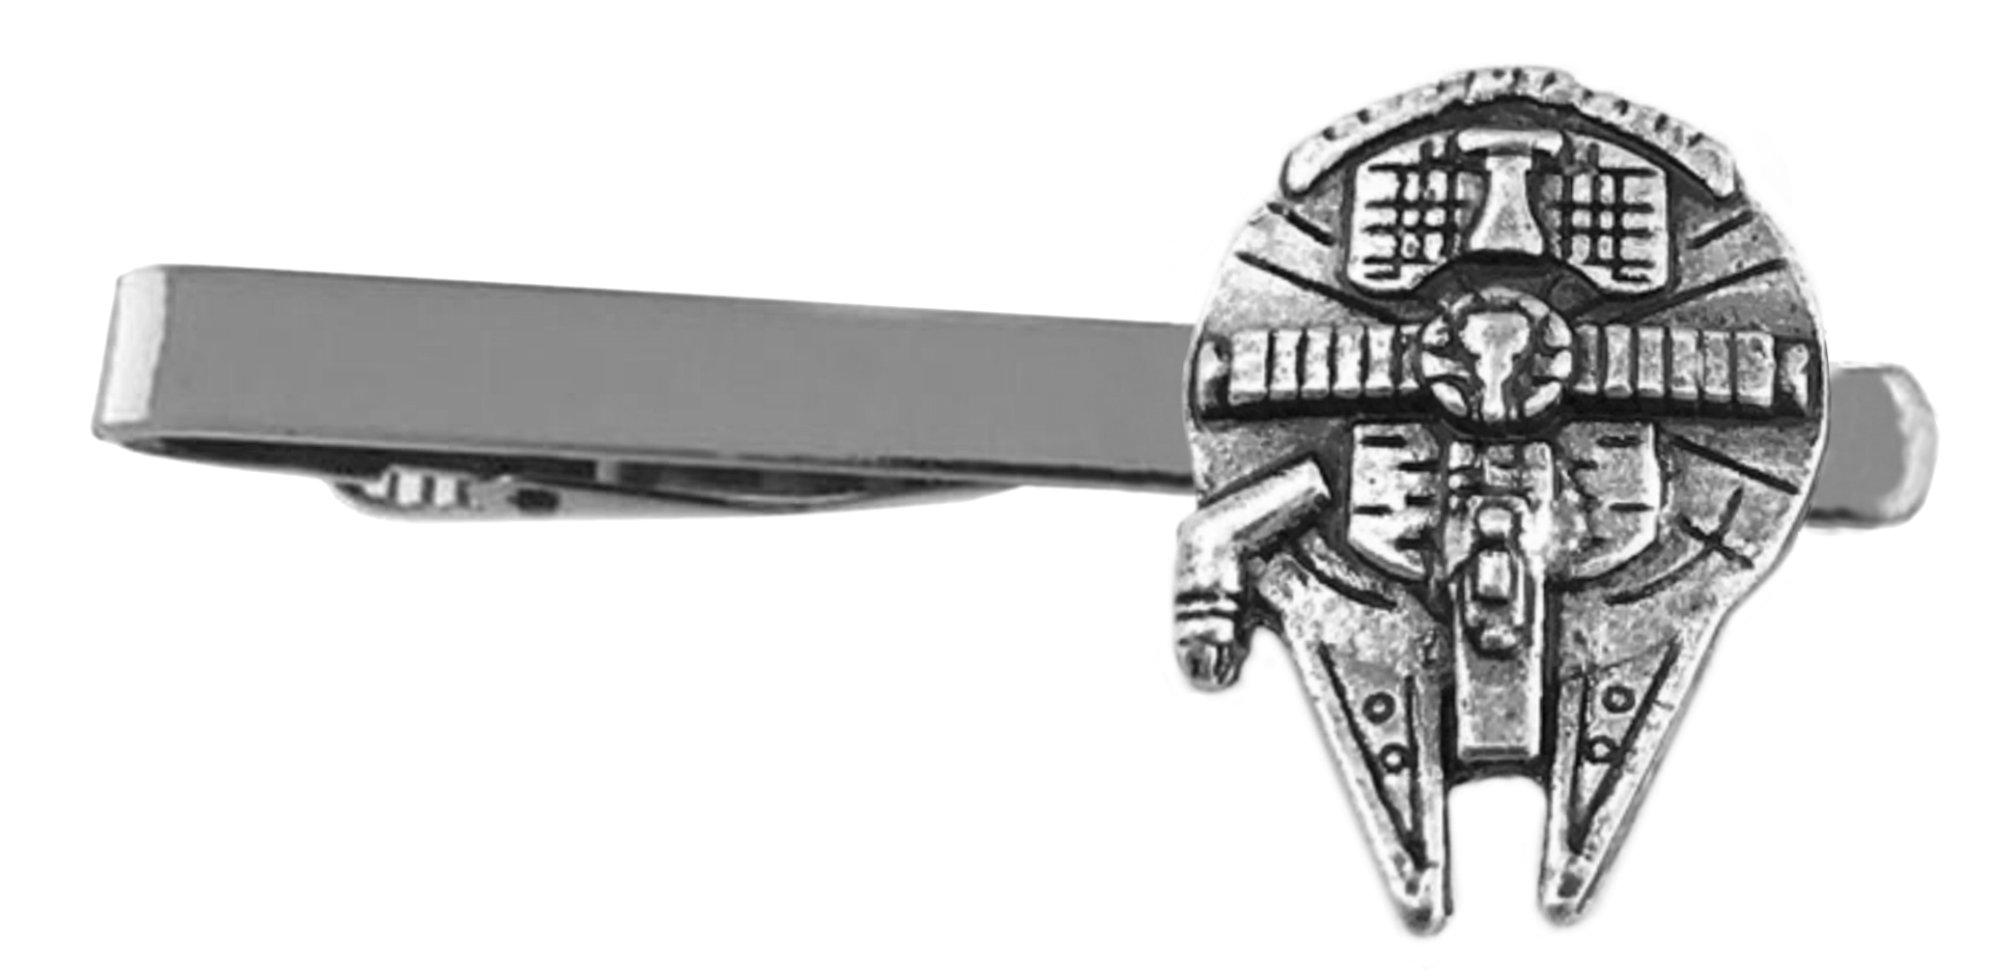 Outlander Star Wars - Millenium Falcon - Movie Series - Tiebar Tie Clasp Wedding Sci-fi Movies Comics Superhero Logo w/Gift Box